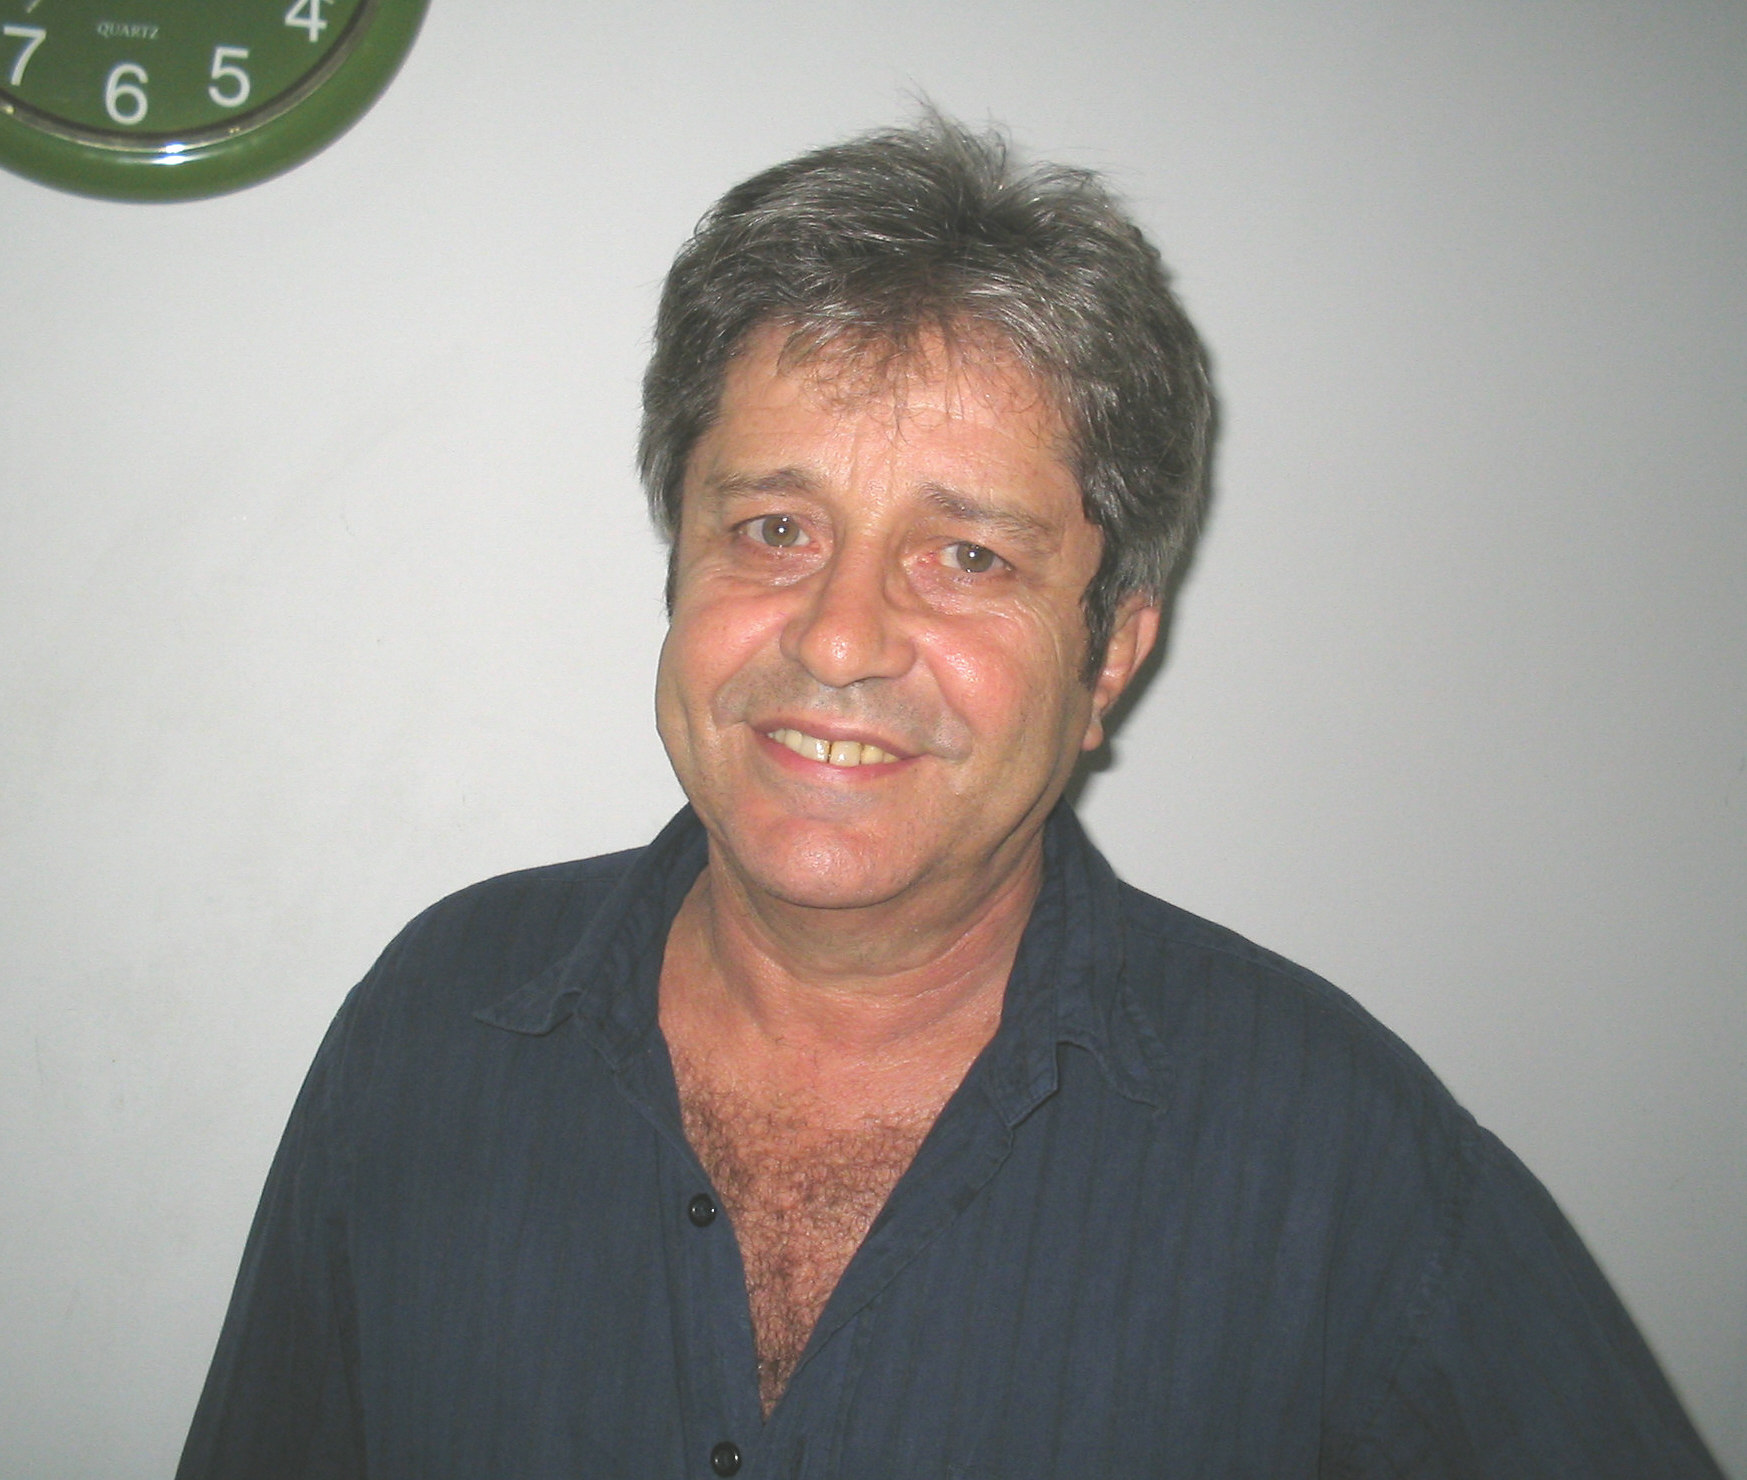 João Carlos Barroso